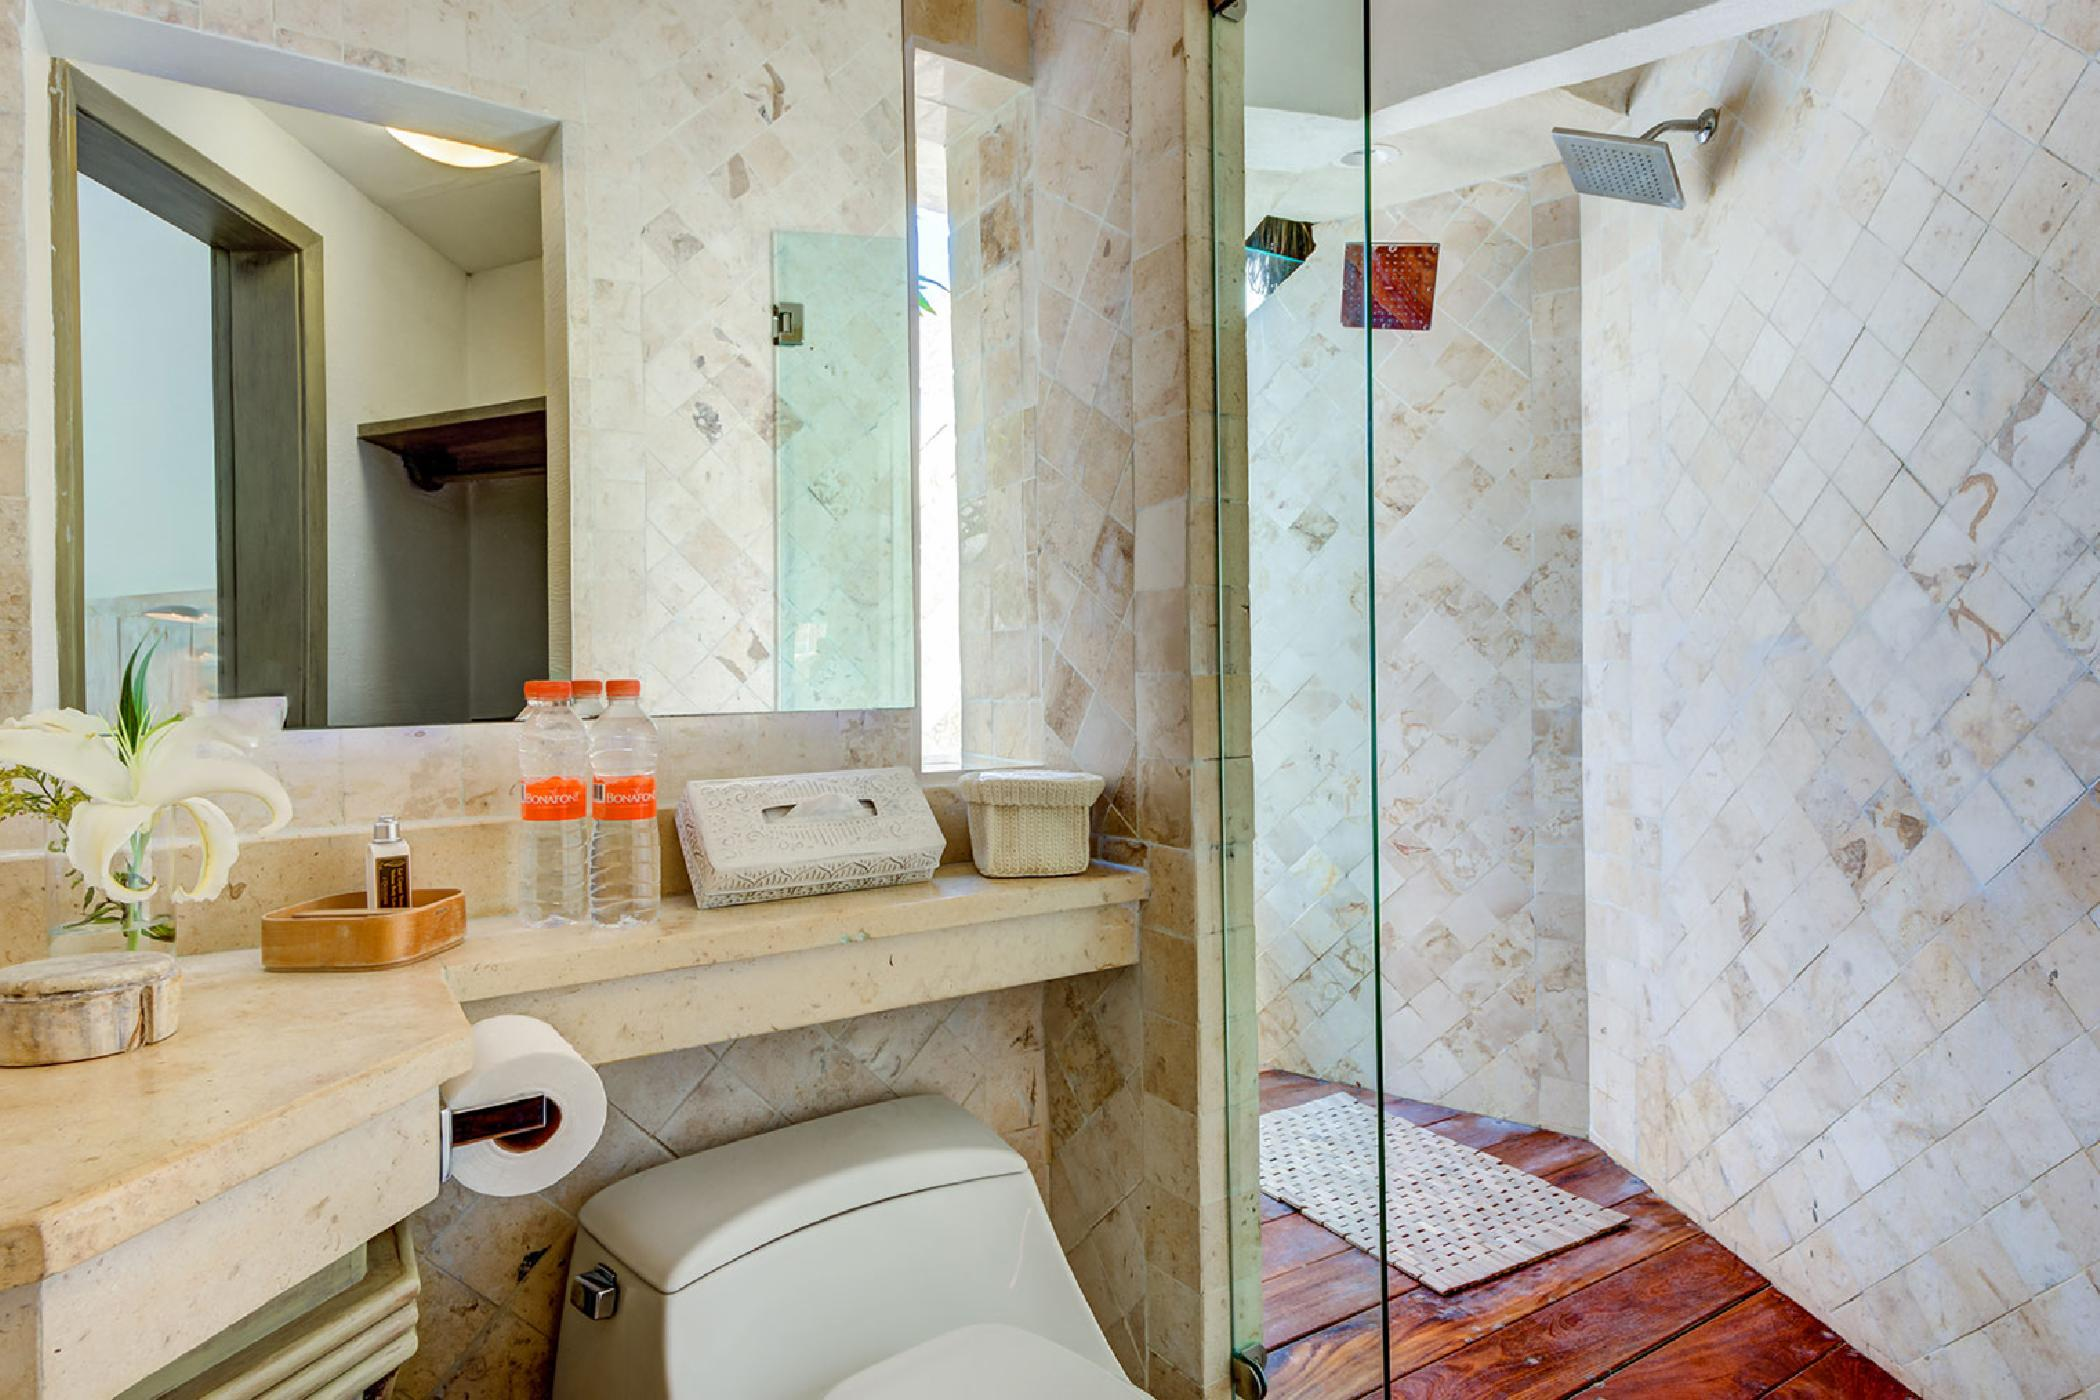 Maya_Luxe_Riviera_Maya_Luxury_Villas_Experiences_Puerto_Aventuras_5_Bedrooms_Zacil_Na_28.jpg